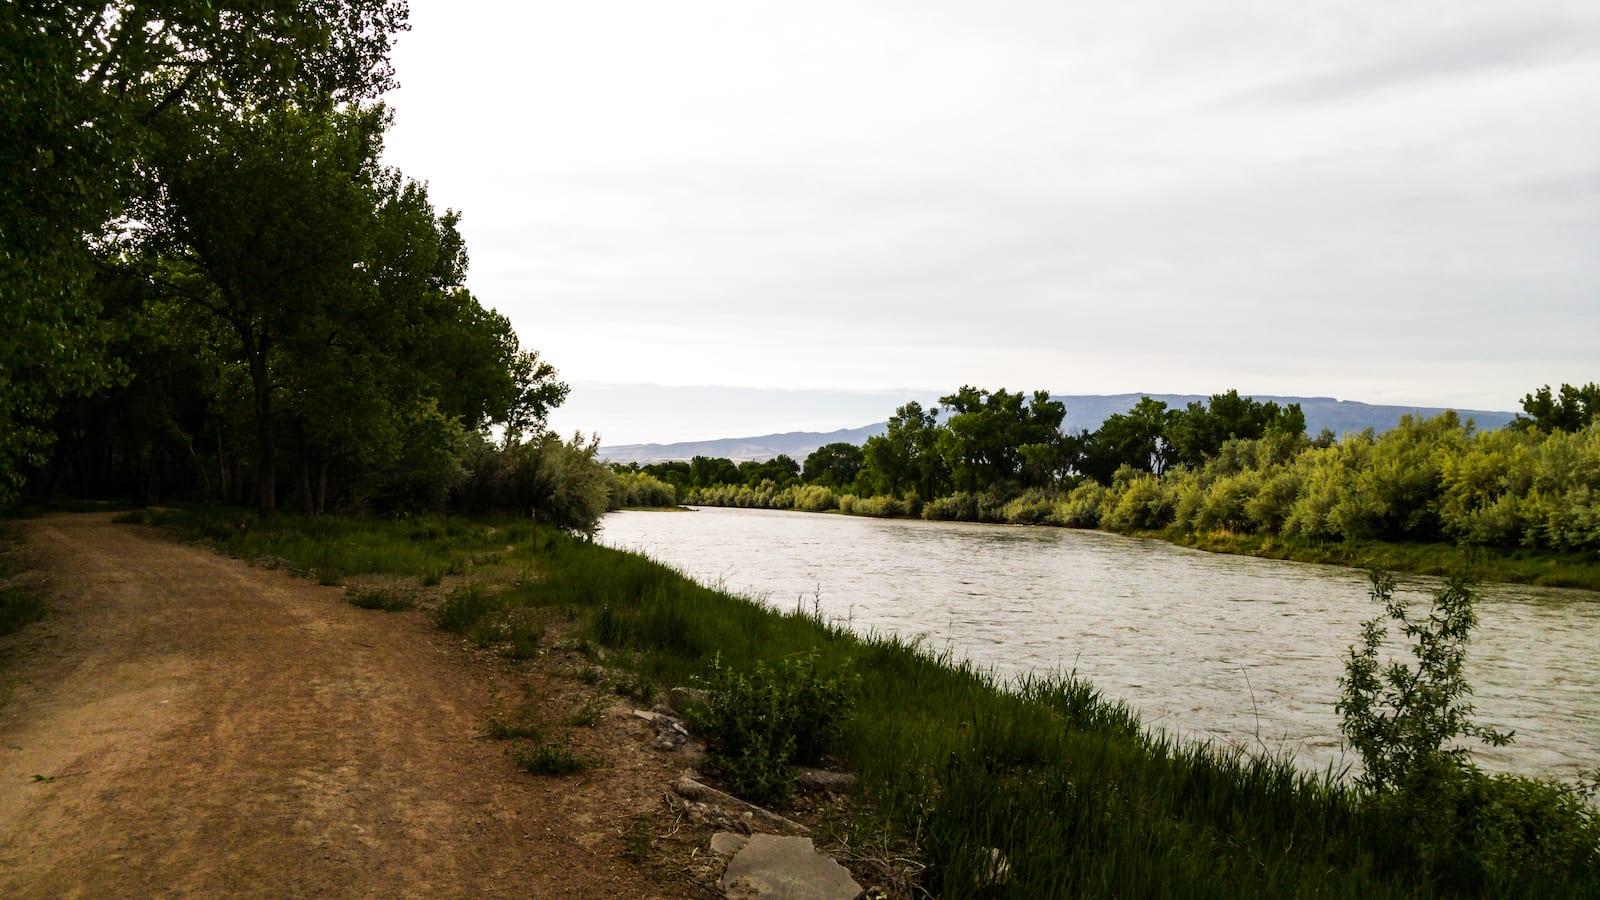 Delta Confluence Park Hiking Trail beside the Gunnison River